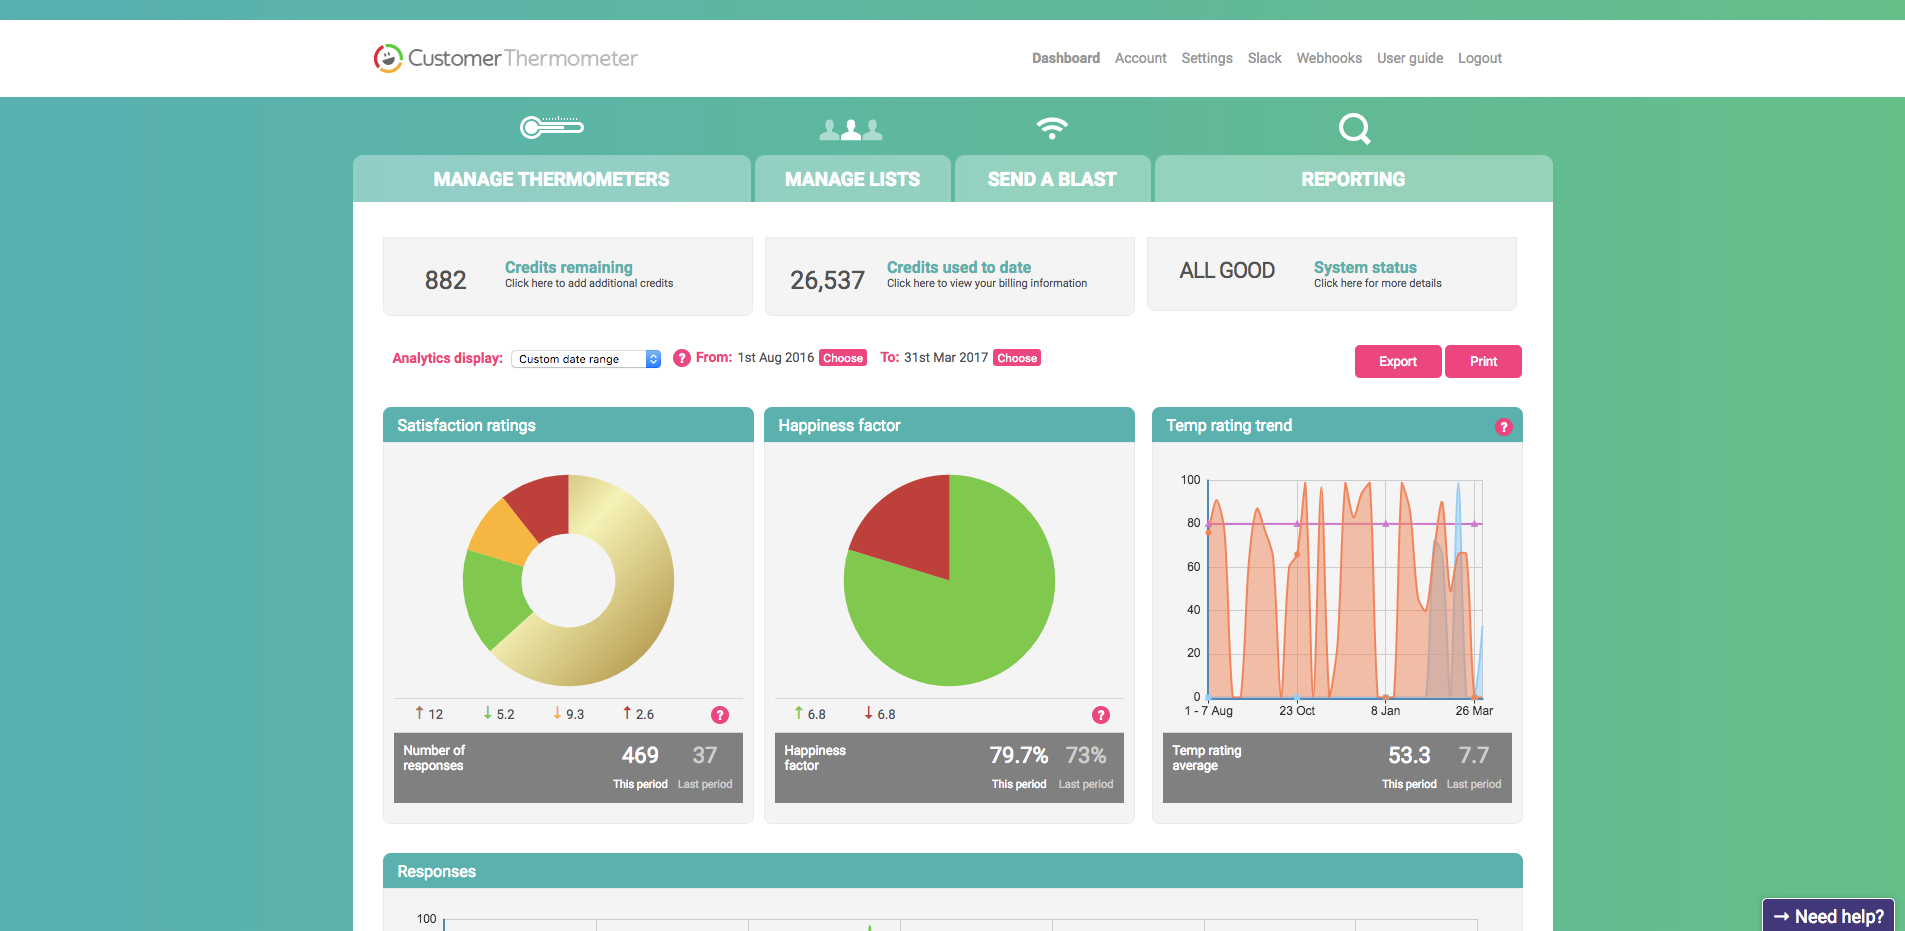 Customer Thermometer screenshot: Reporting Dashboard - Top